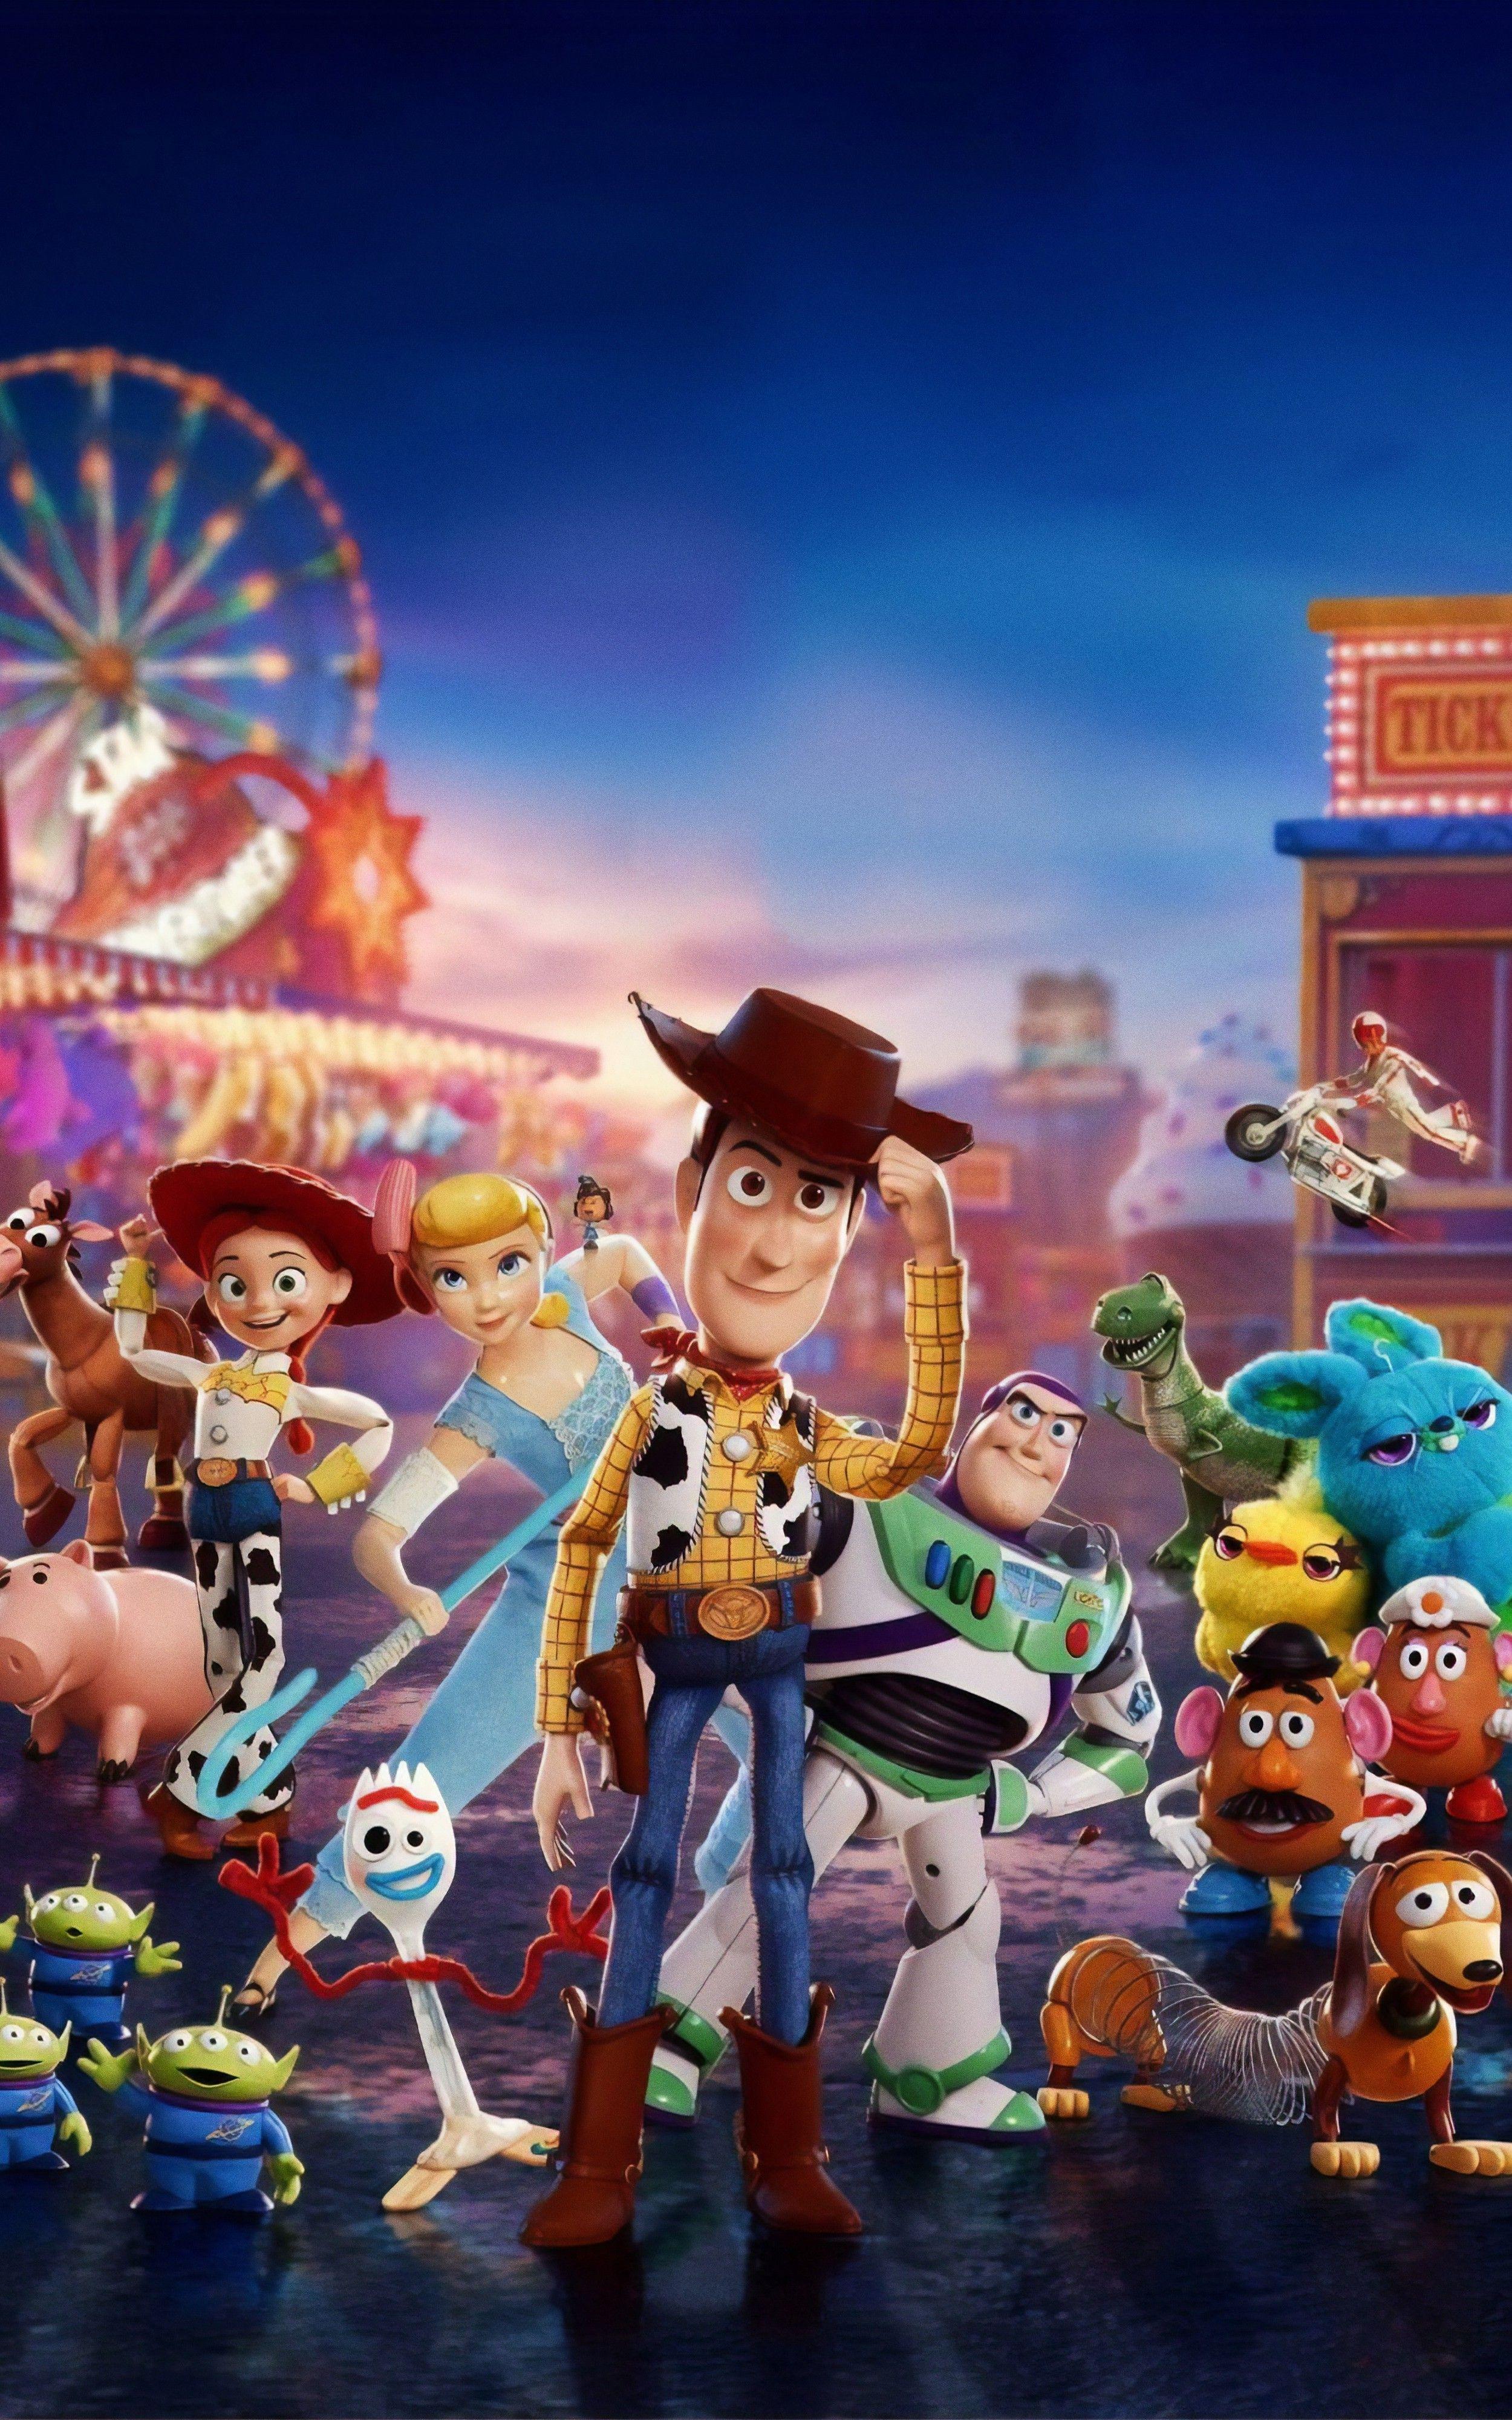 Toy story 4 Wallpaper Fondos de pantalla de películas